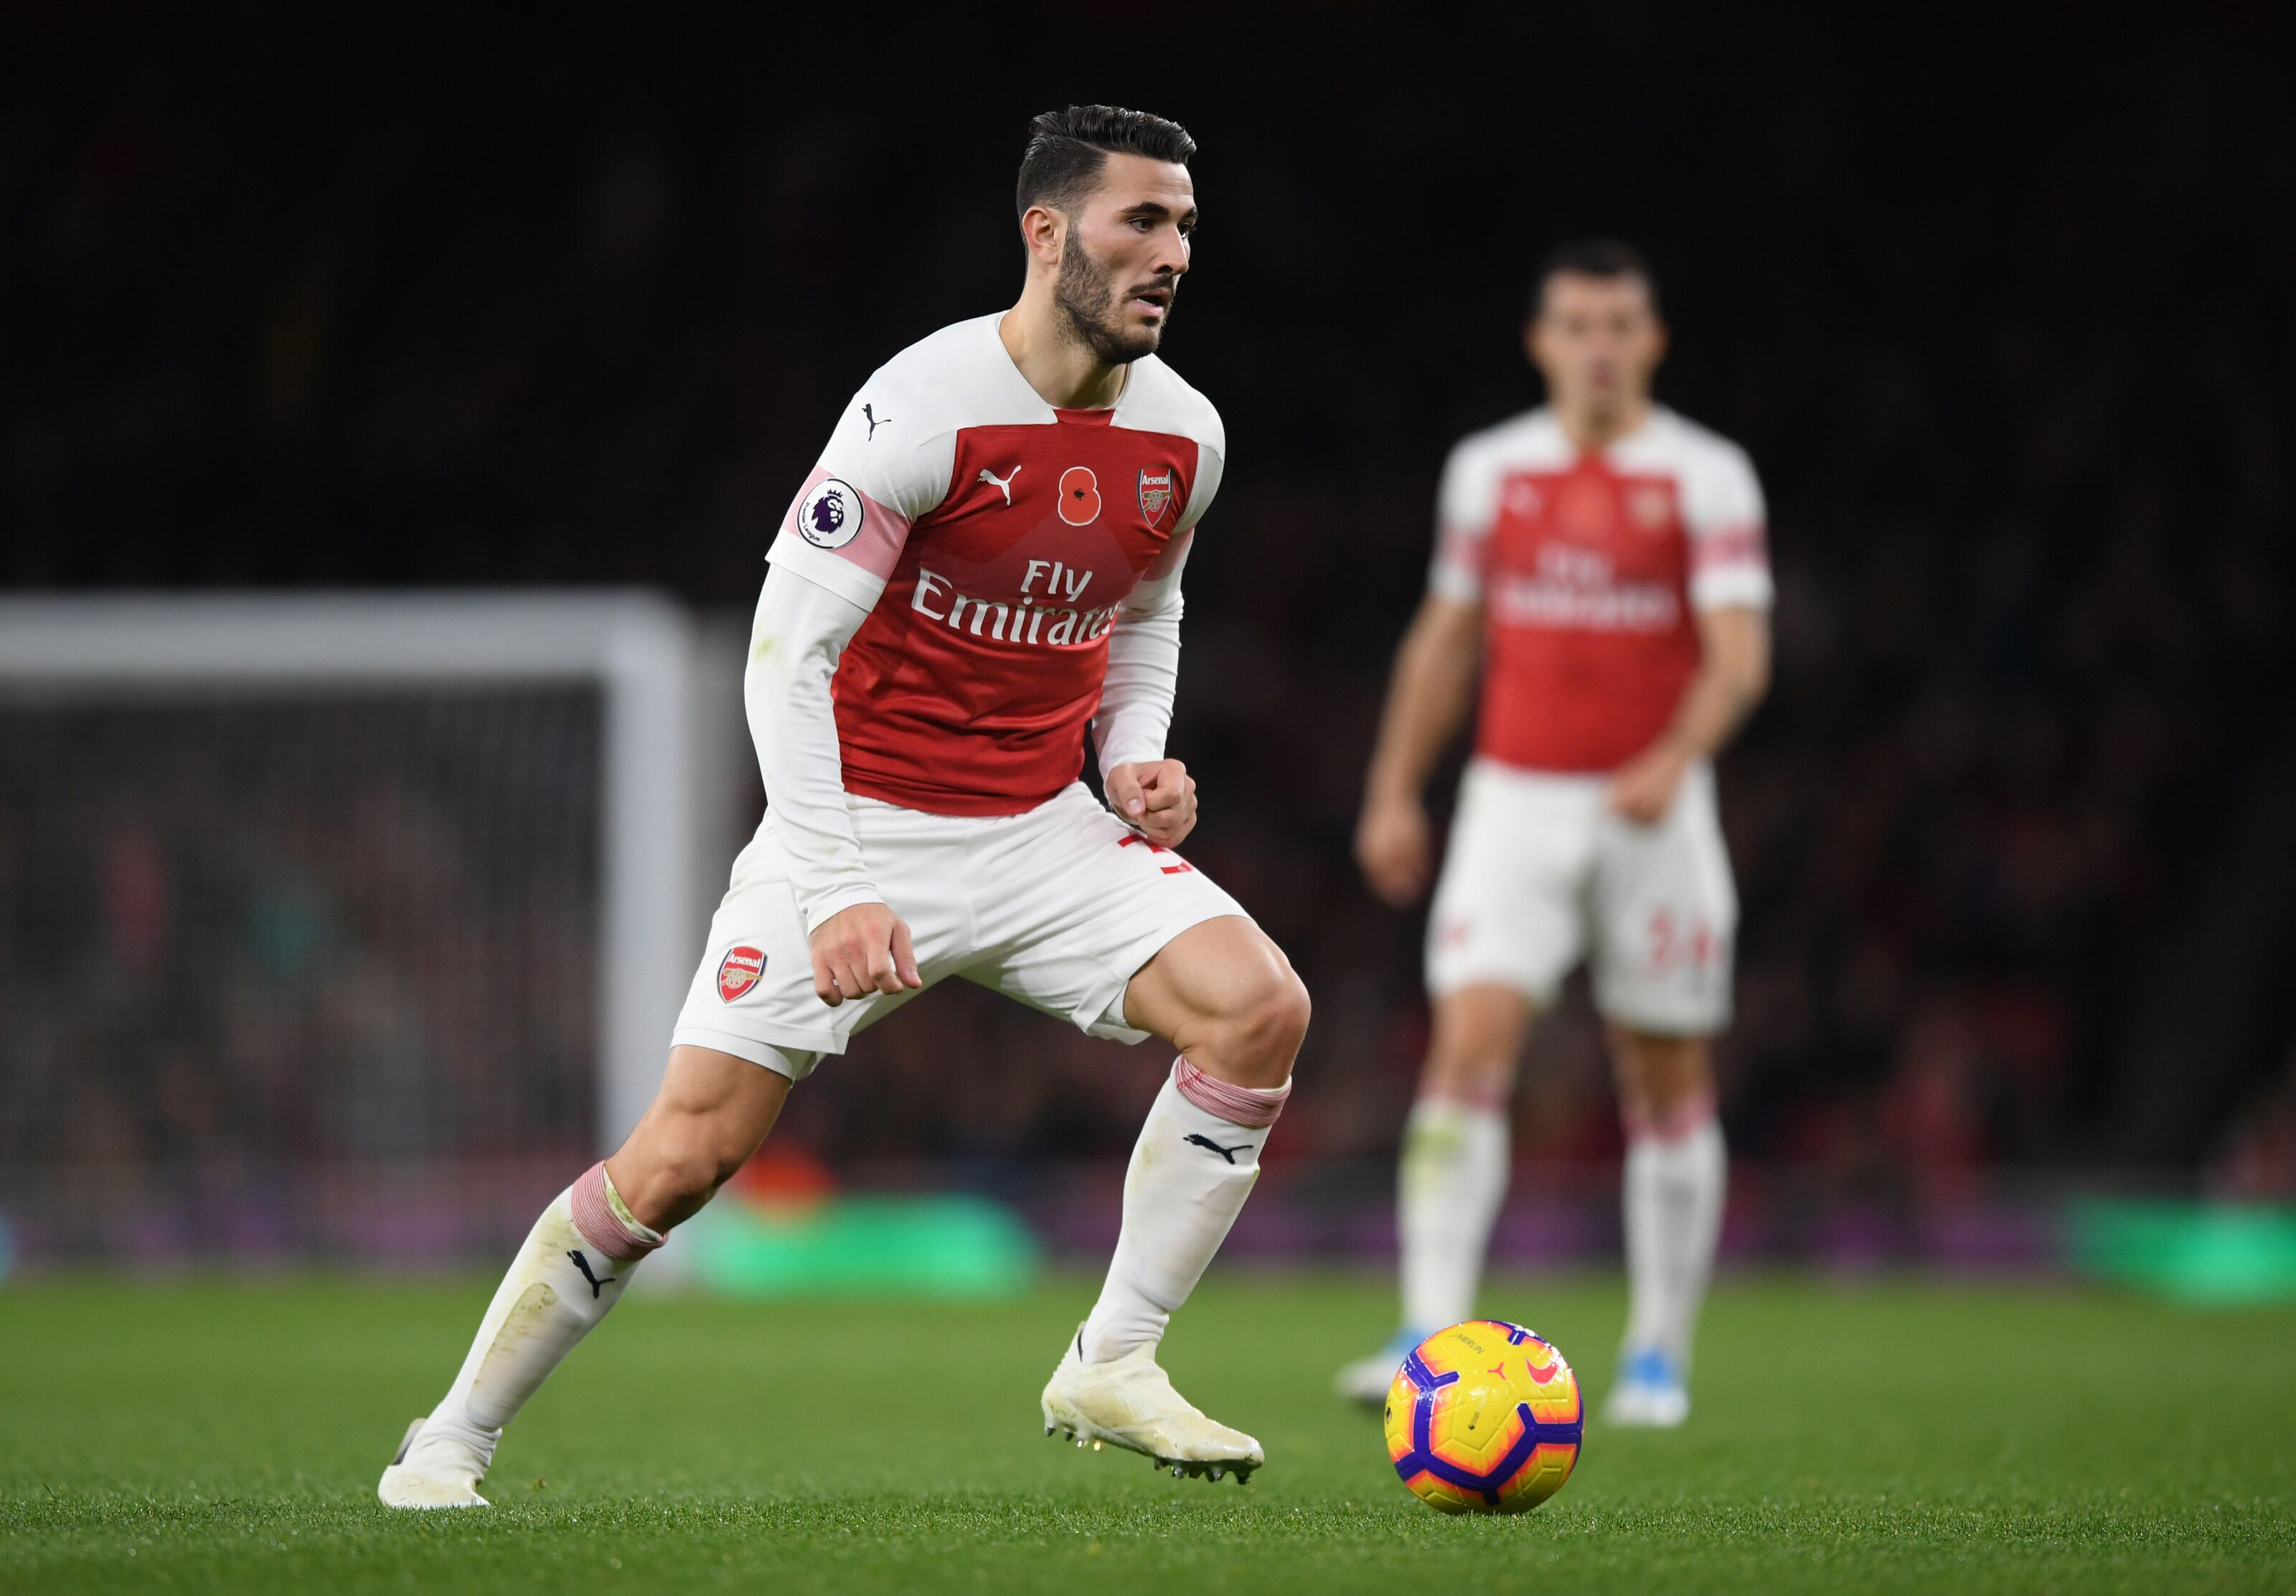 Arsenal: Sead Kolasinac has Maitland-Niles to thank as well